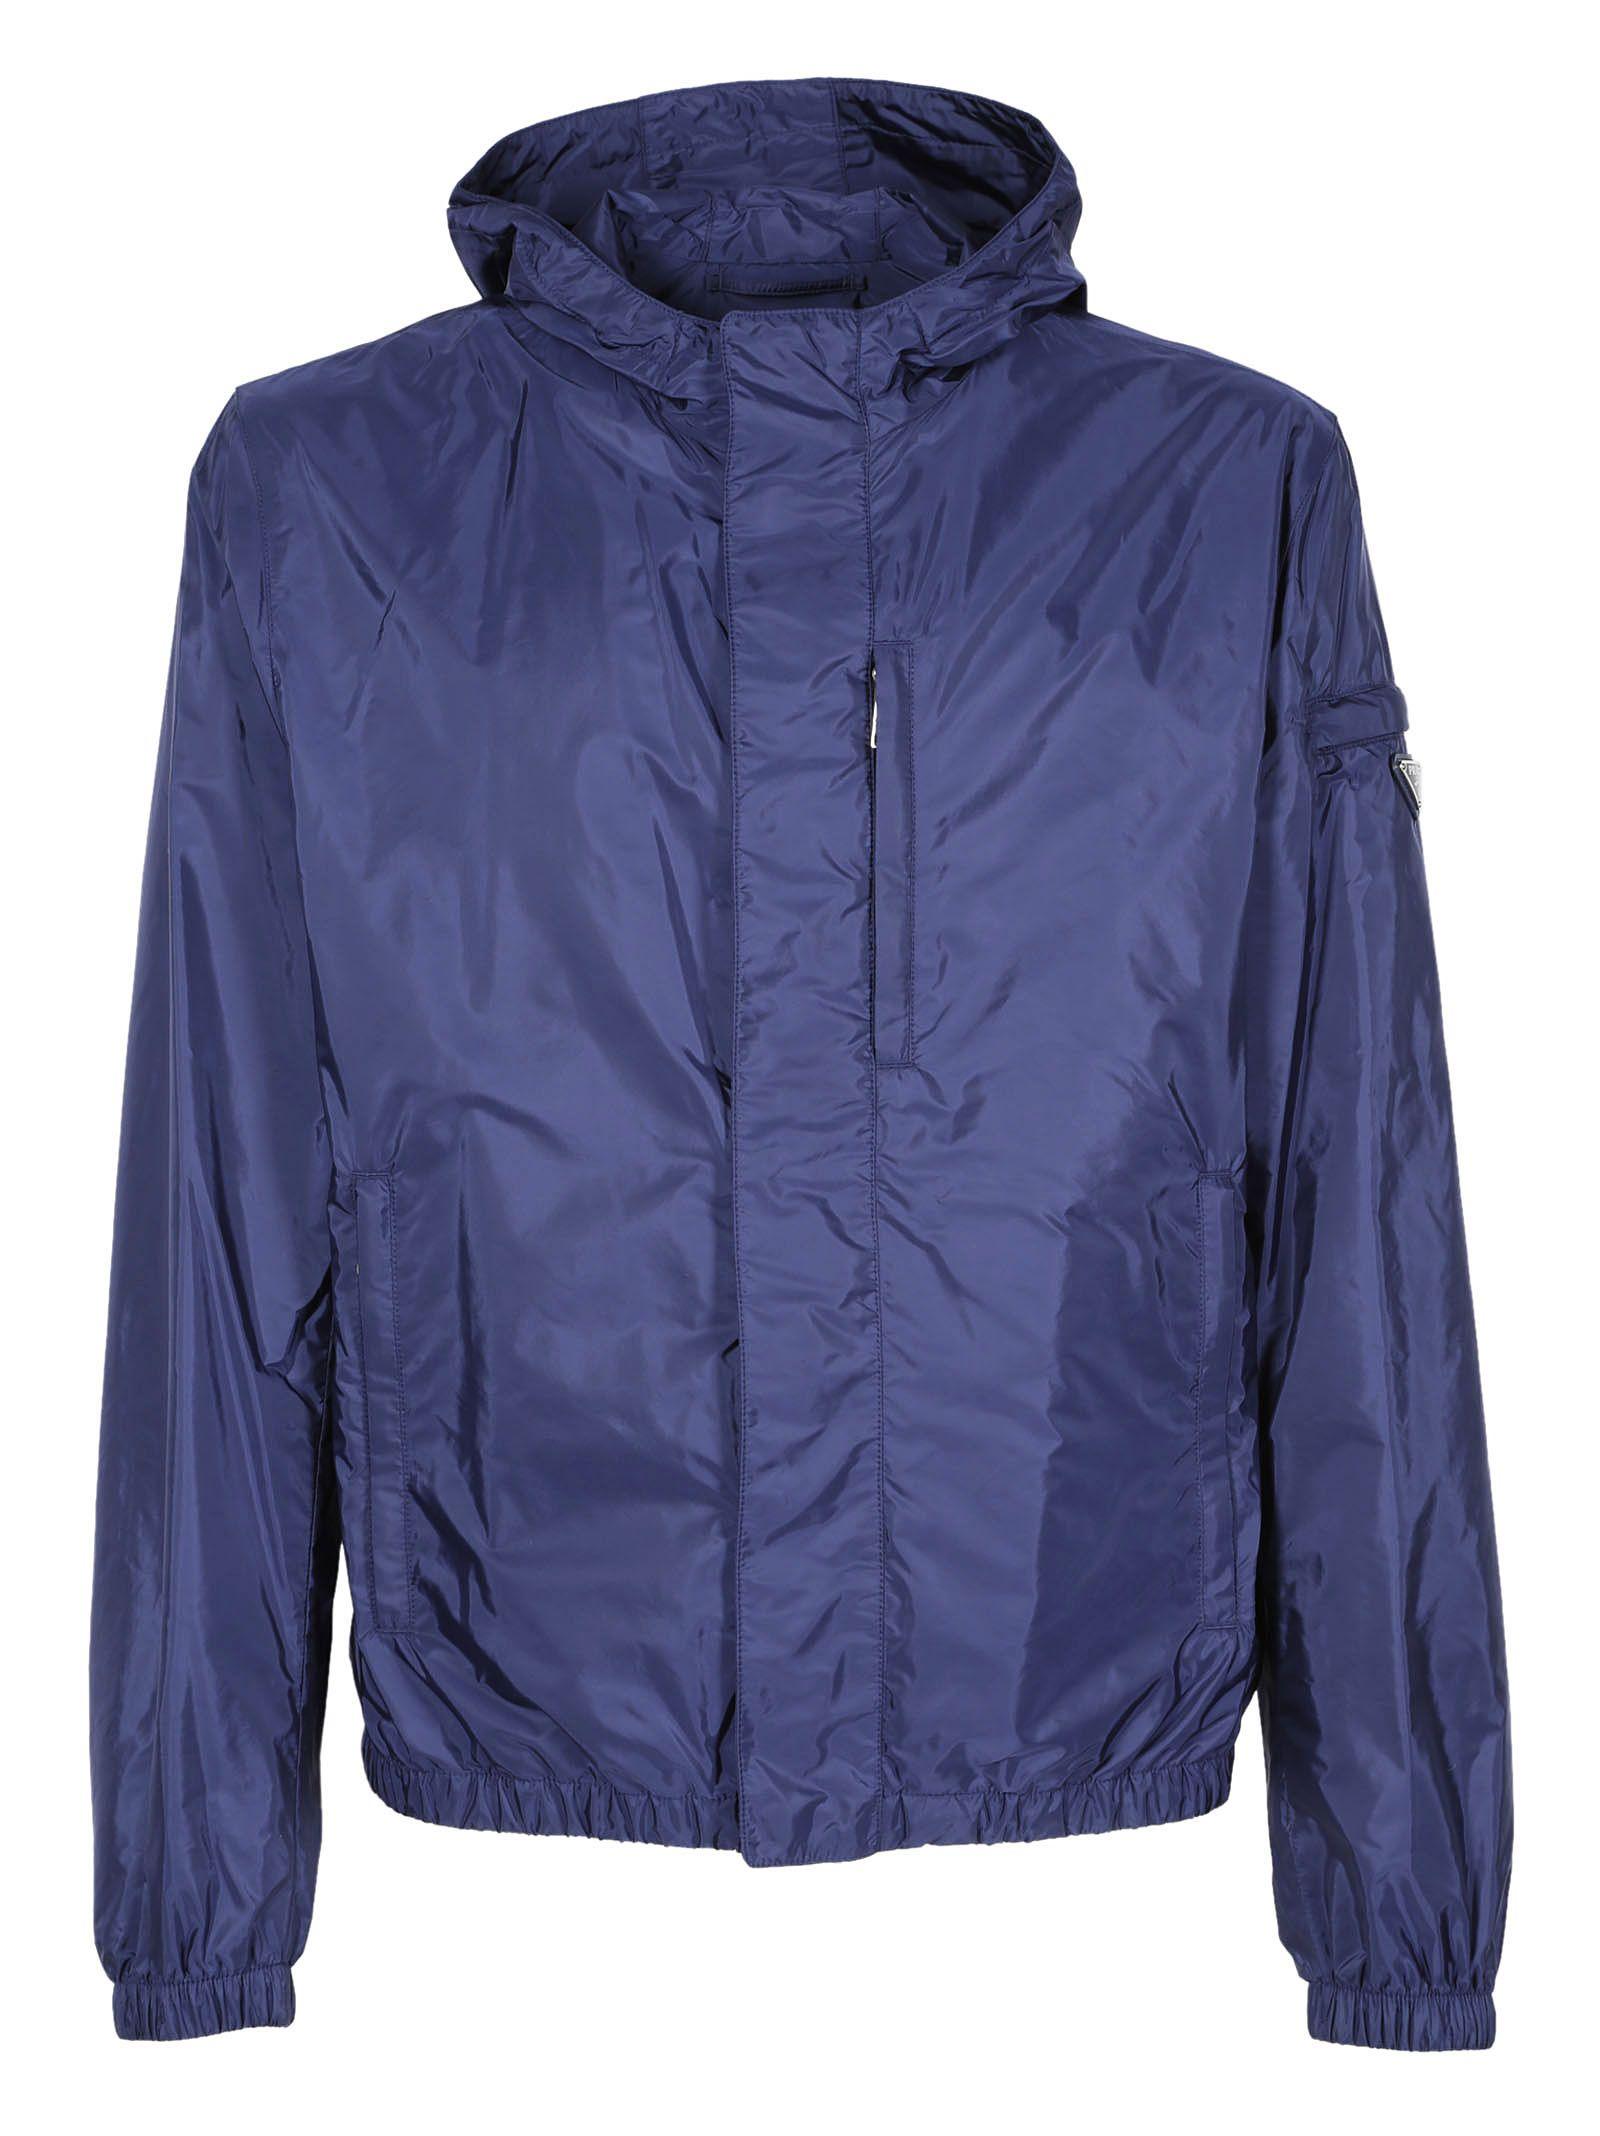 Prada Linea Rossa Kway Jacket